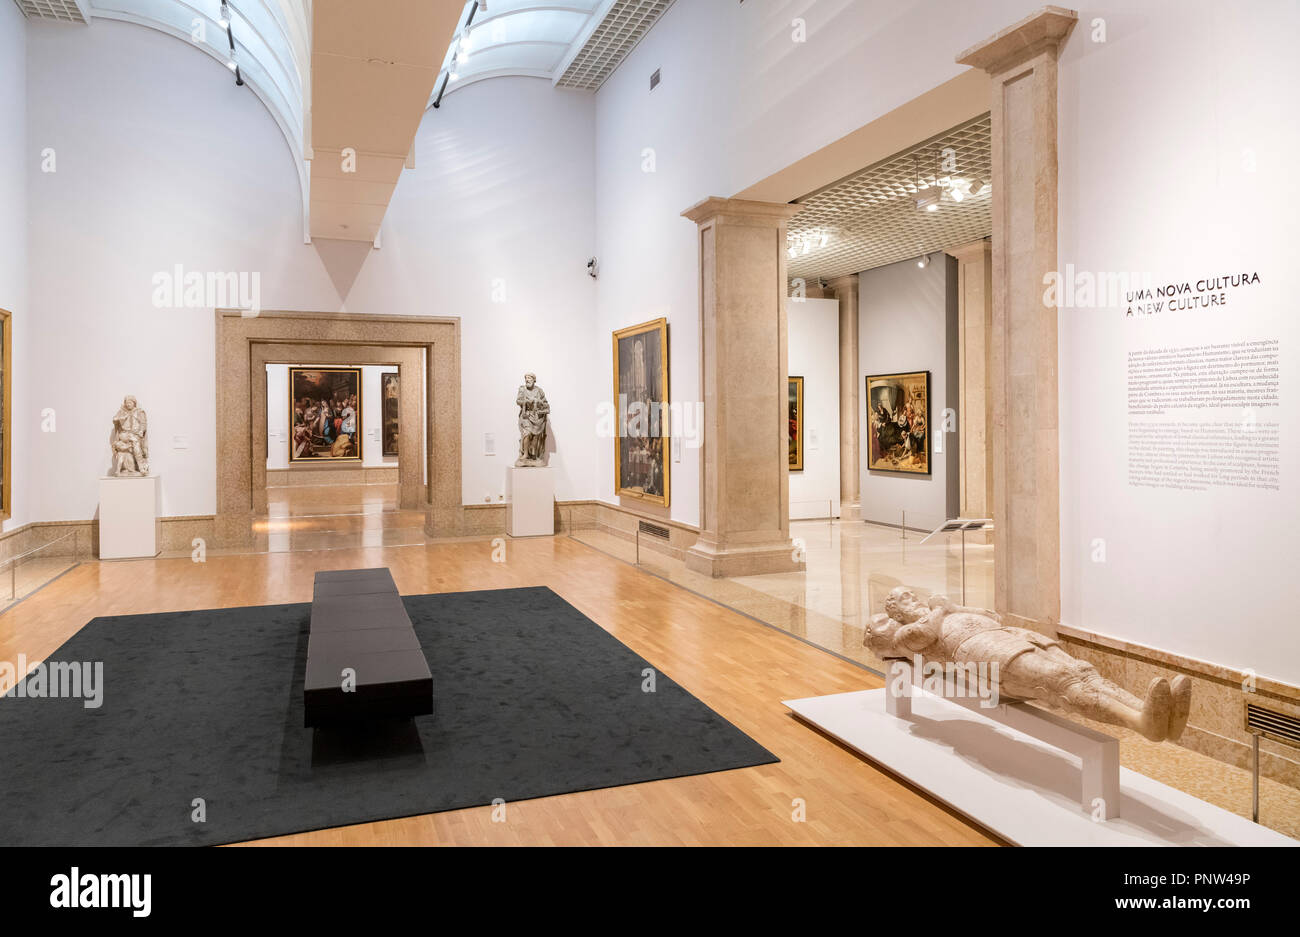 Gallery in the Museu Nacional de Arte Antiga (National Museum of Ancient Art) Lisbon, Portugal - Stock Image